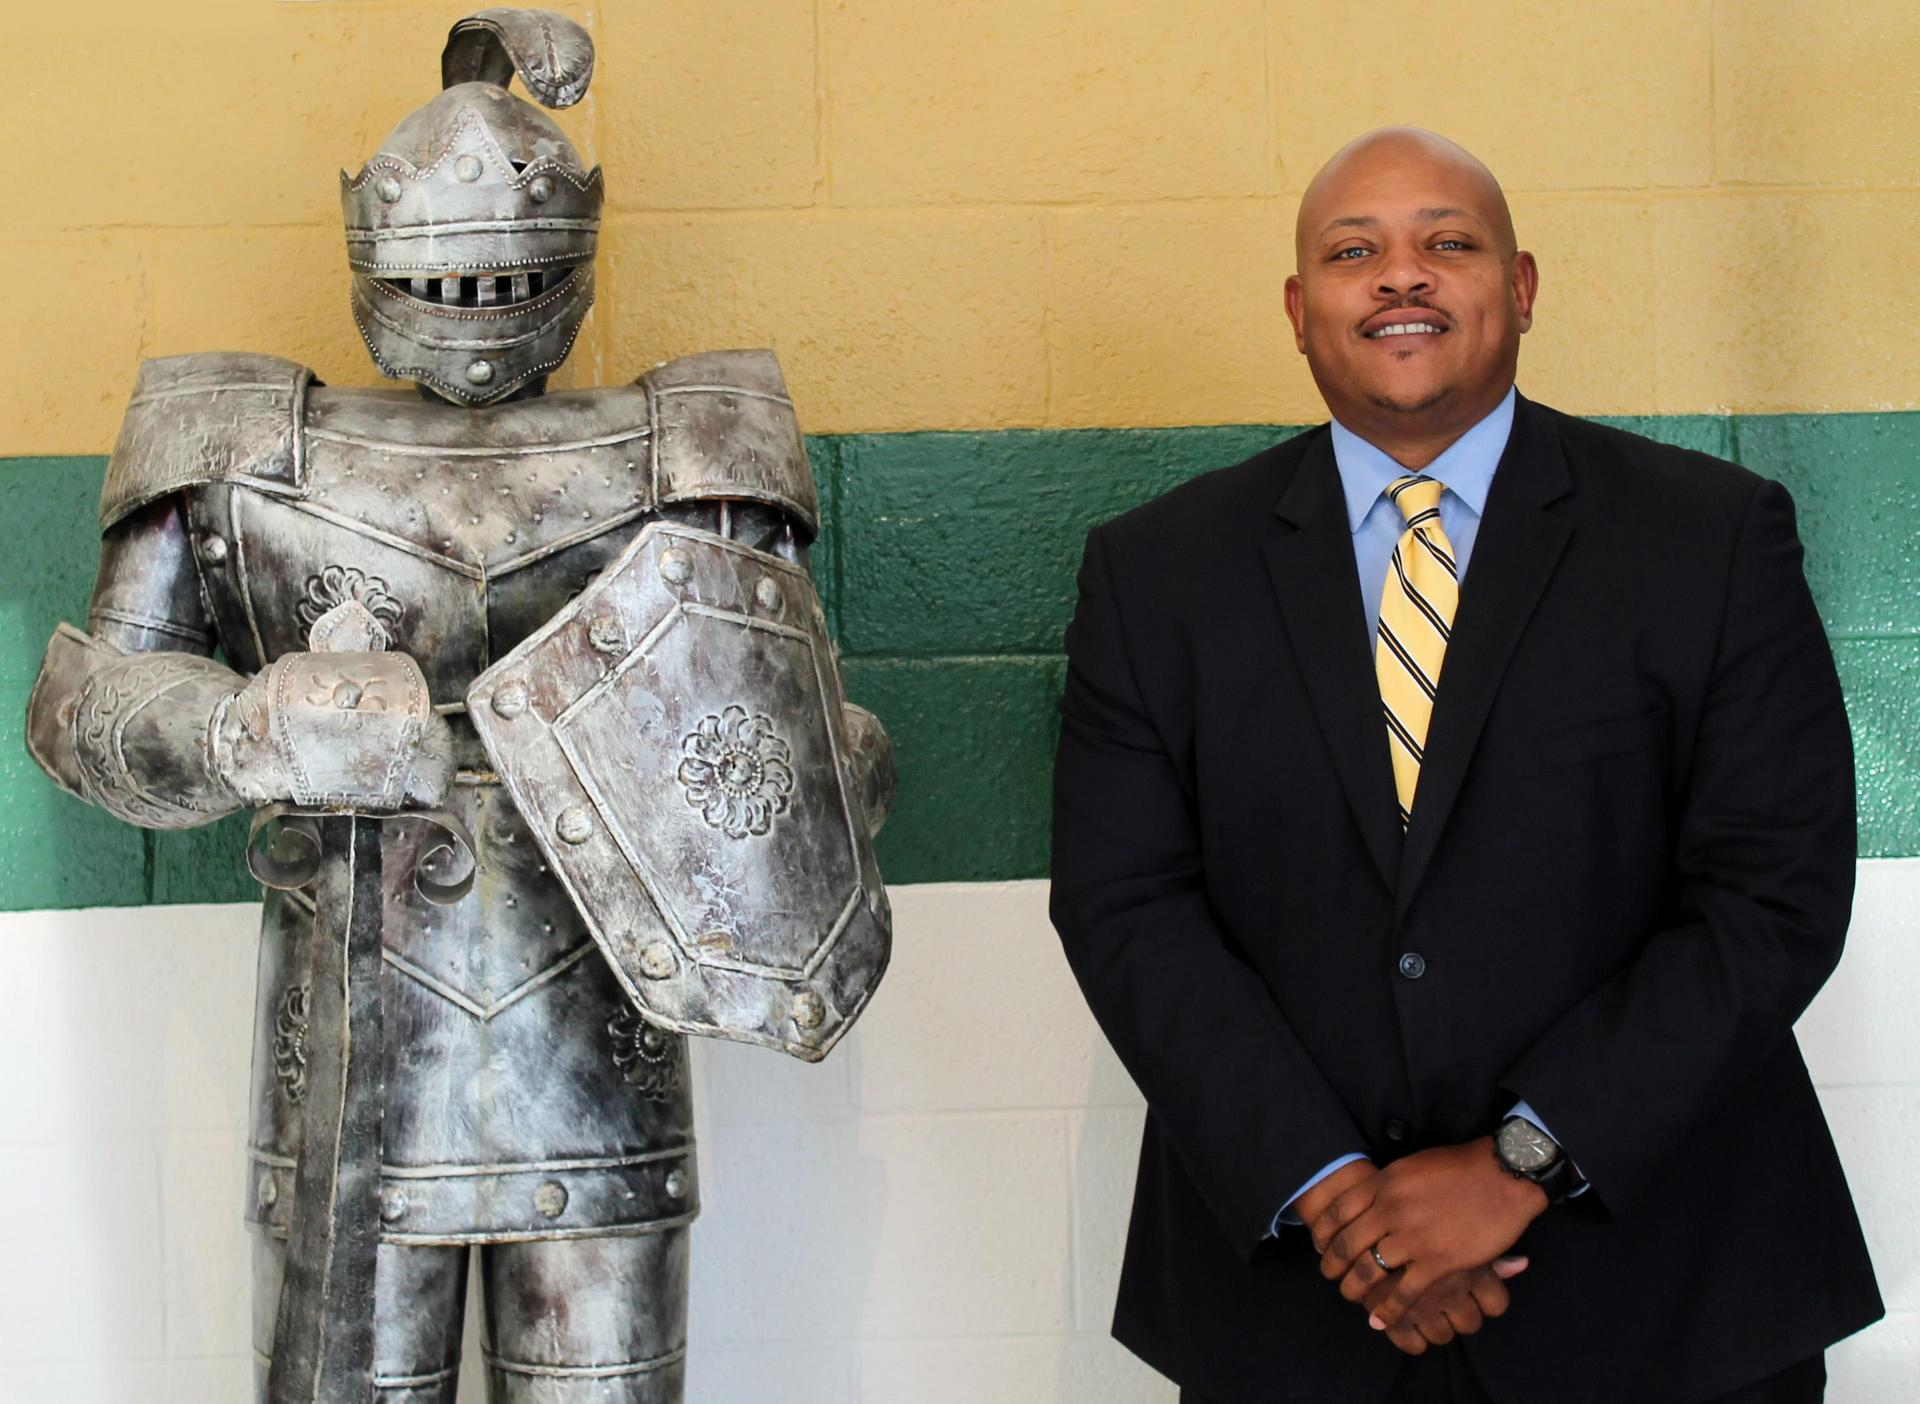 Principal Brian Hopkins